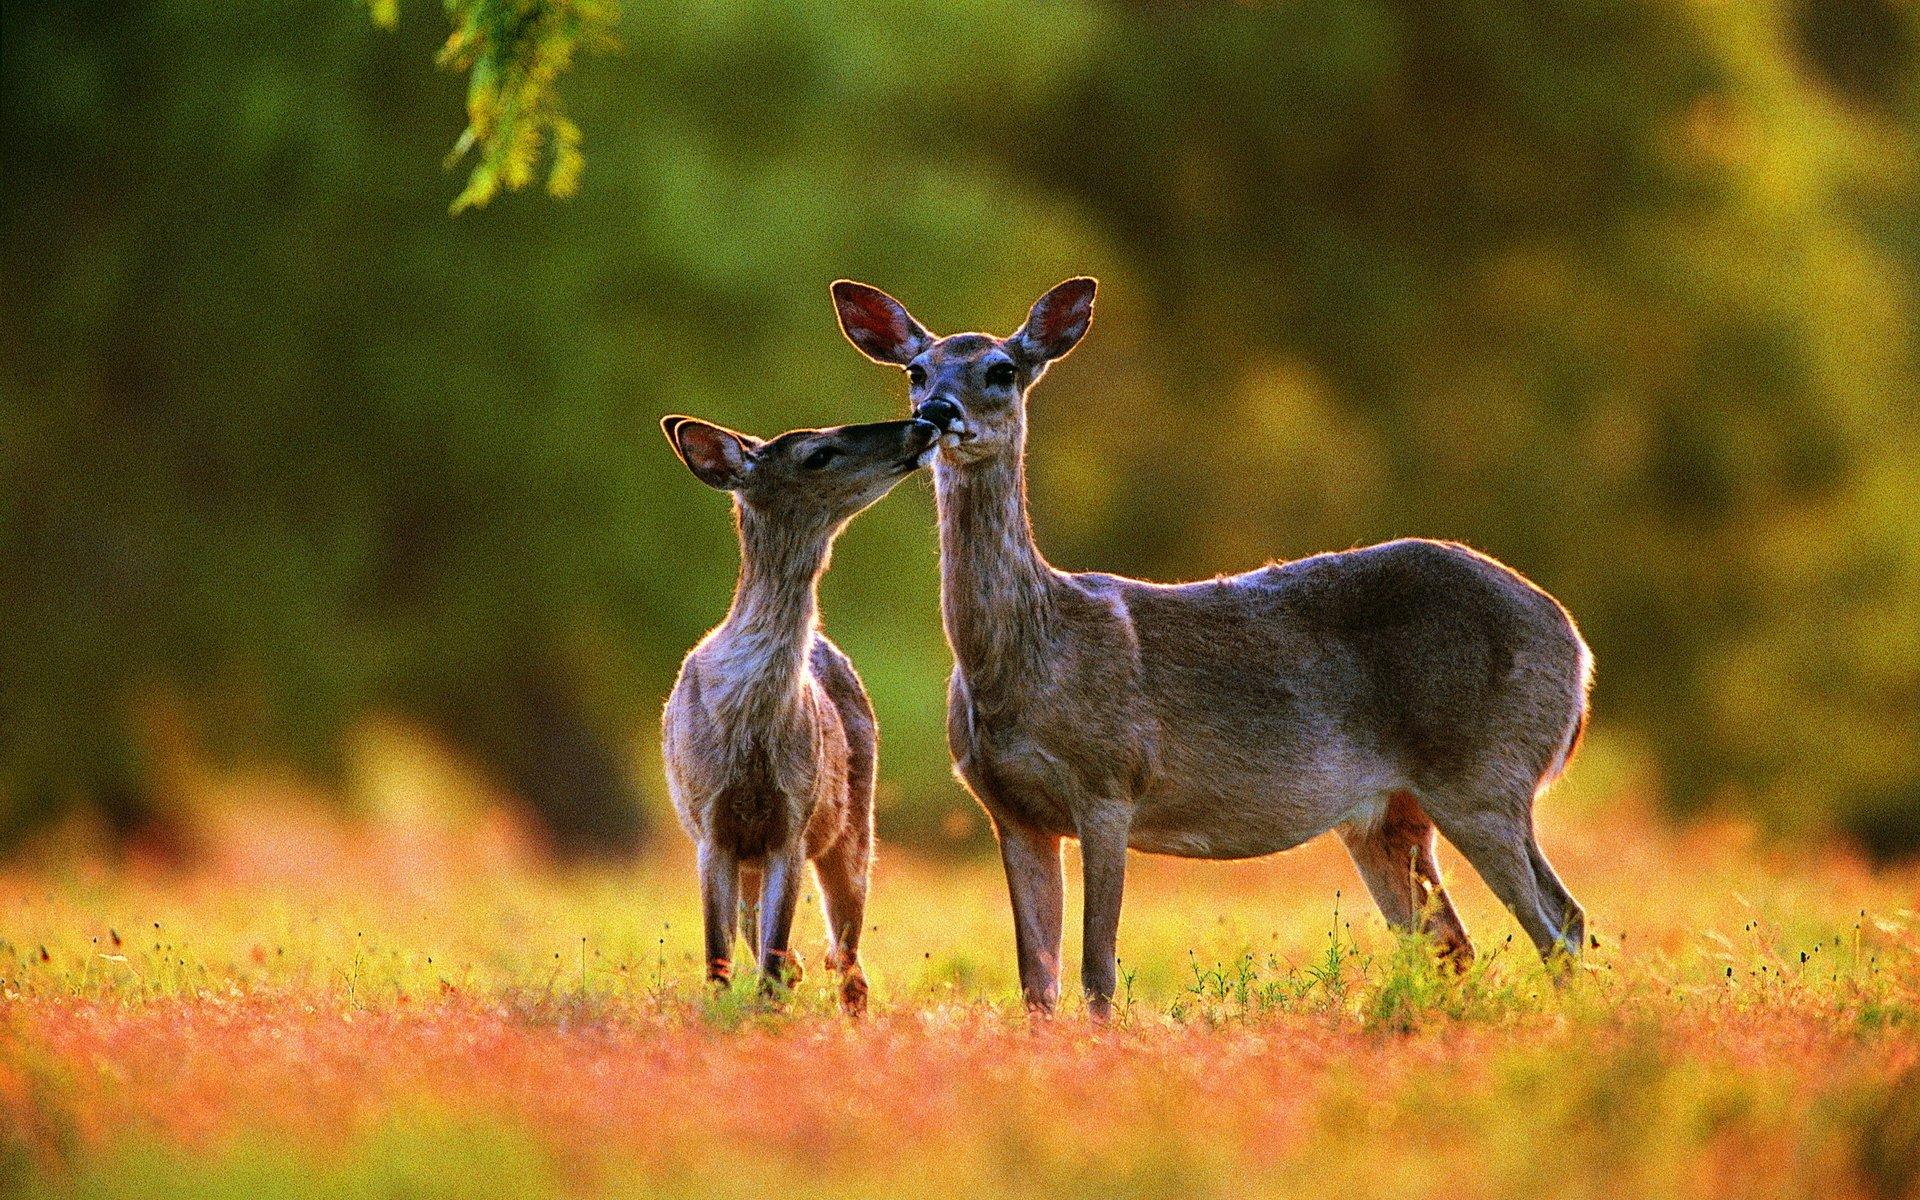 8k Animal Wallpaper Download: Deer HD Wallpaper